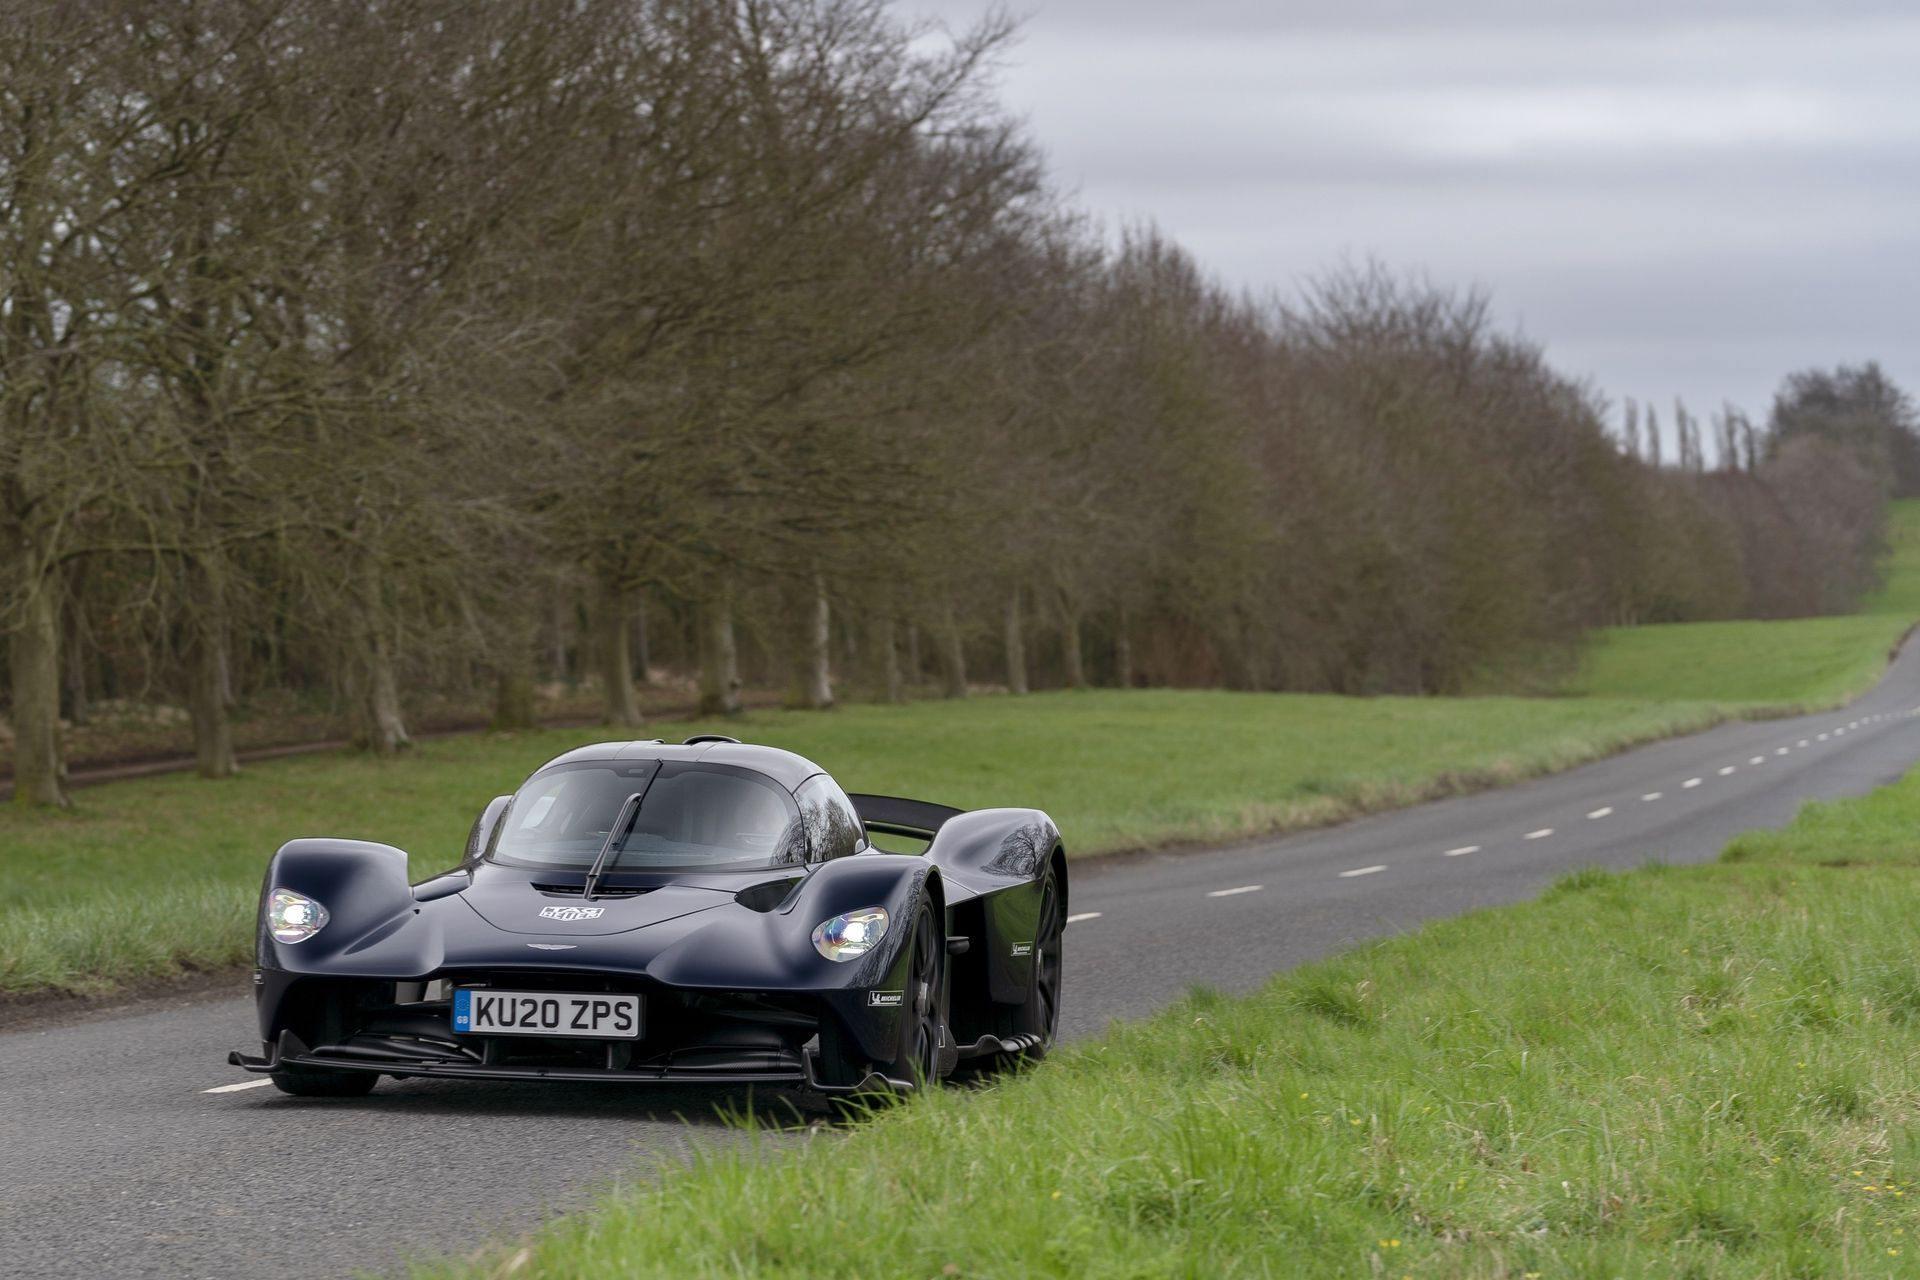 Aston_Martin_Valkyrie_public_roads_0005